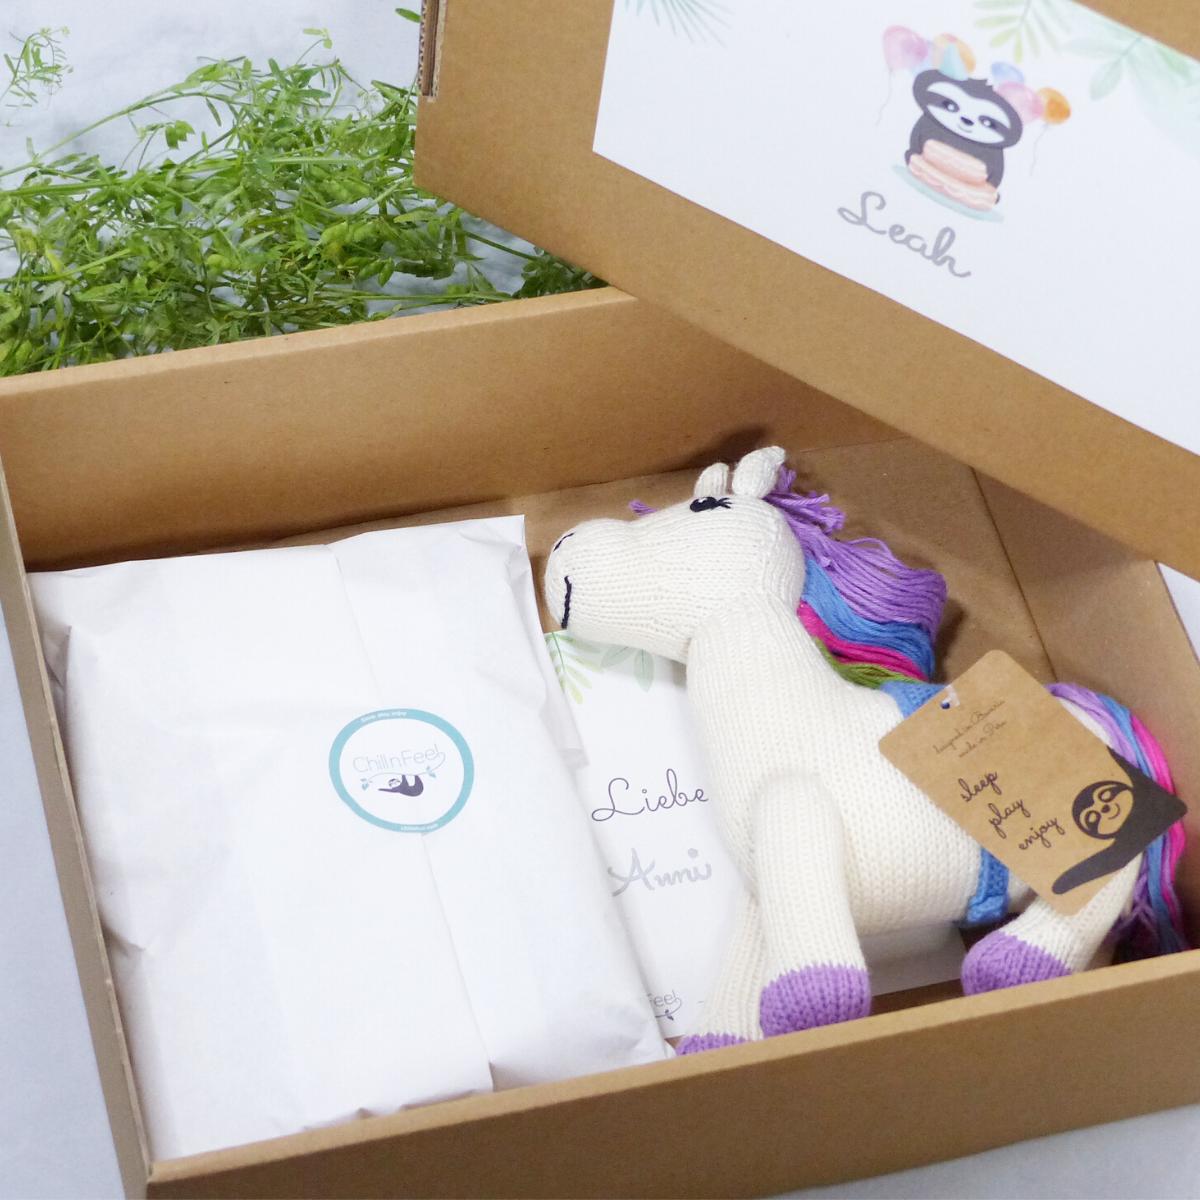 Chill n Feel - Babygeschenke verpacken_Geschenkbox_Geschenkpapier (3)